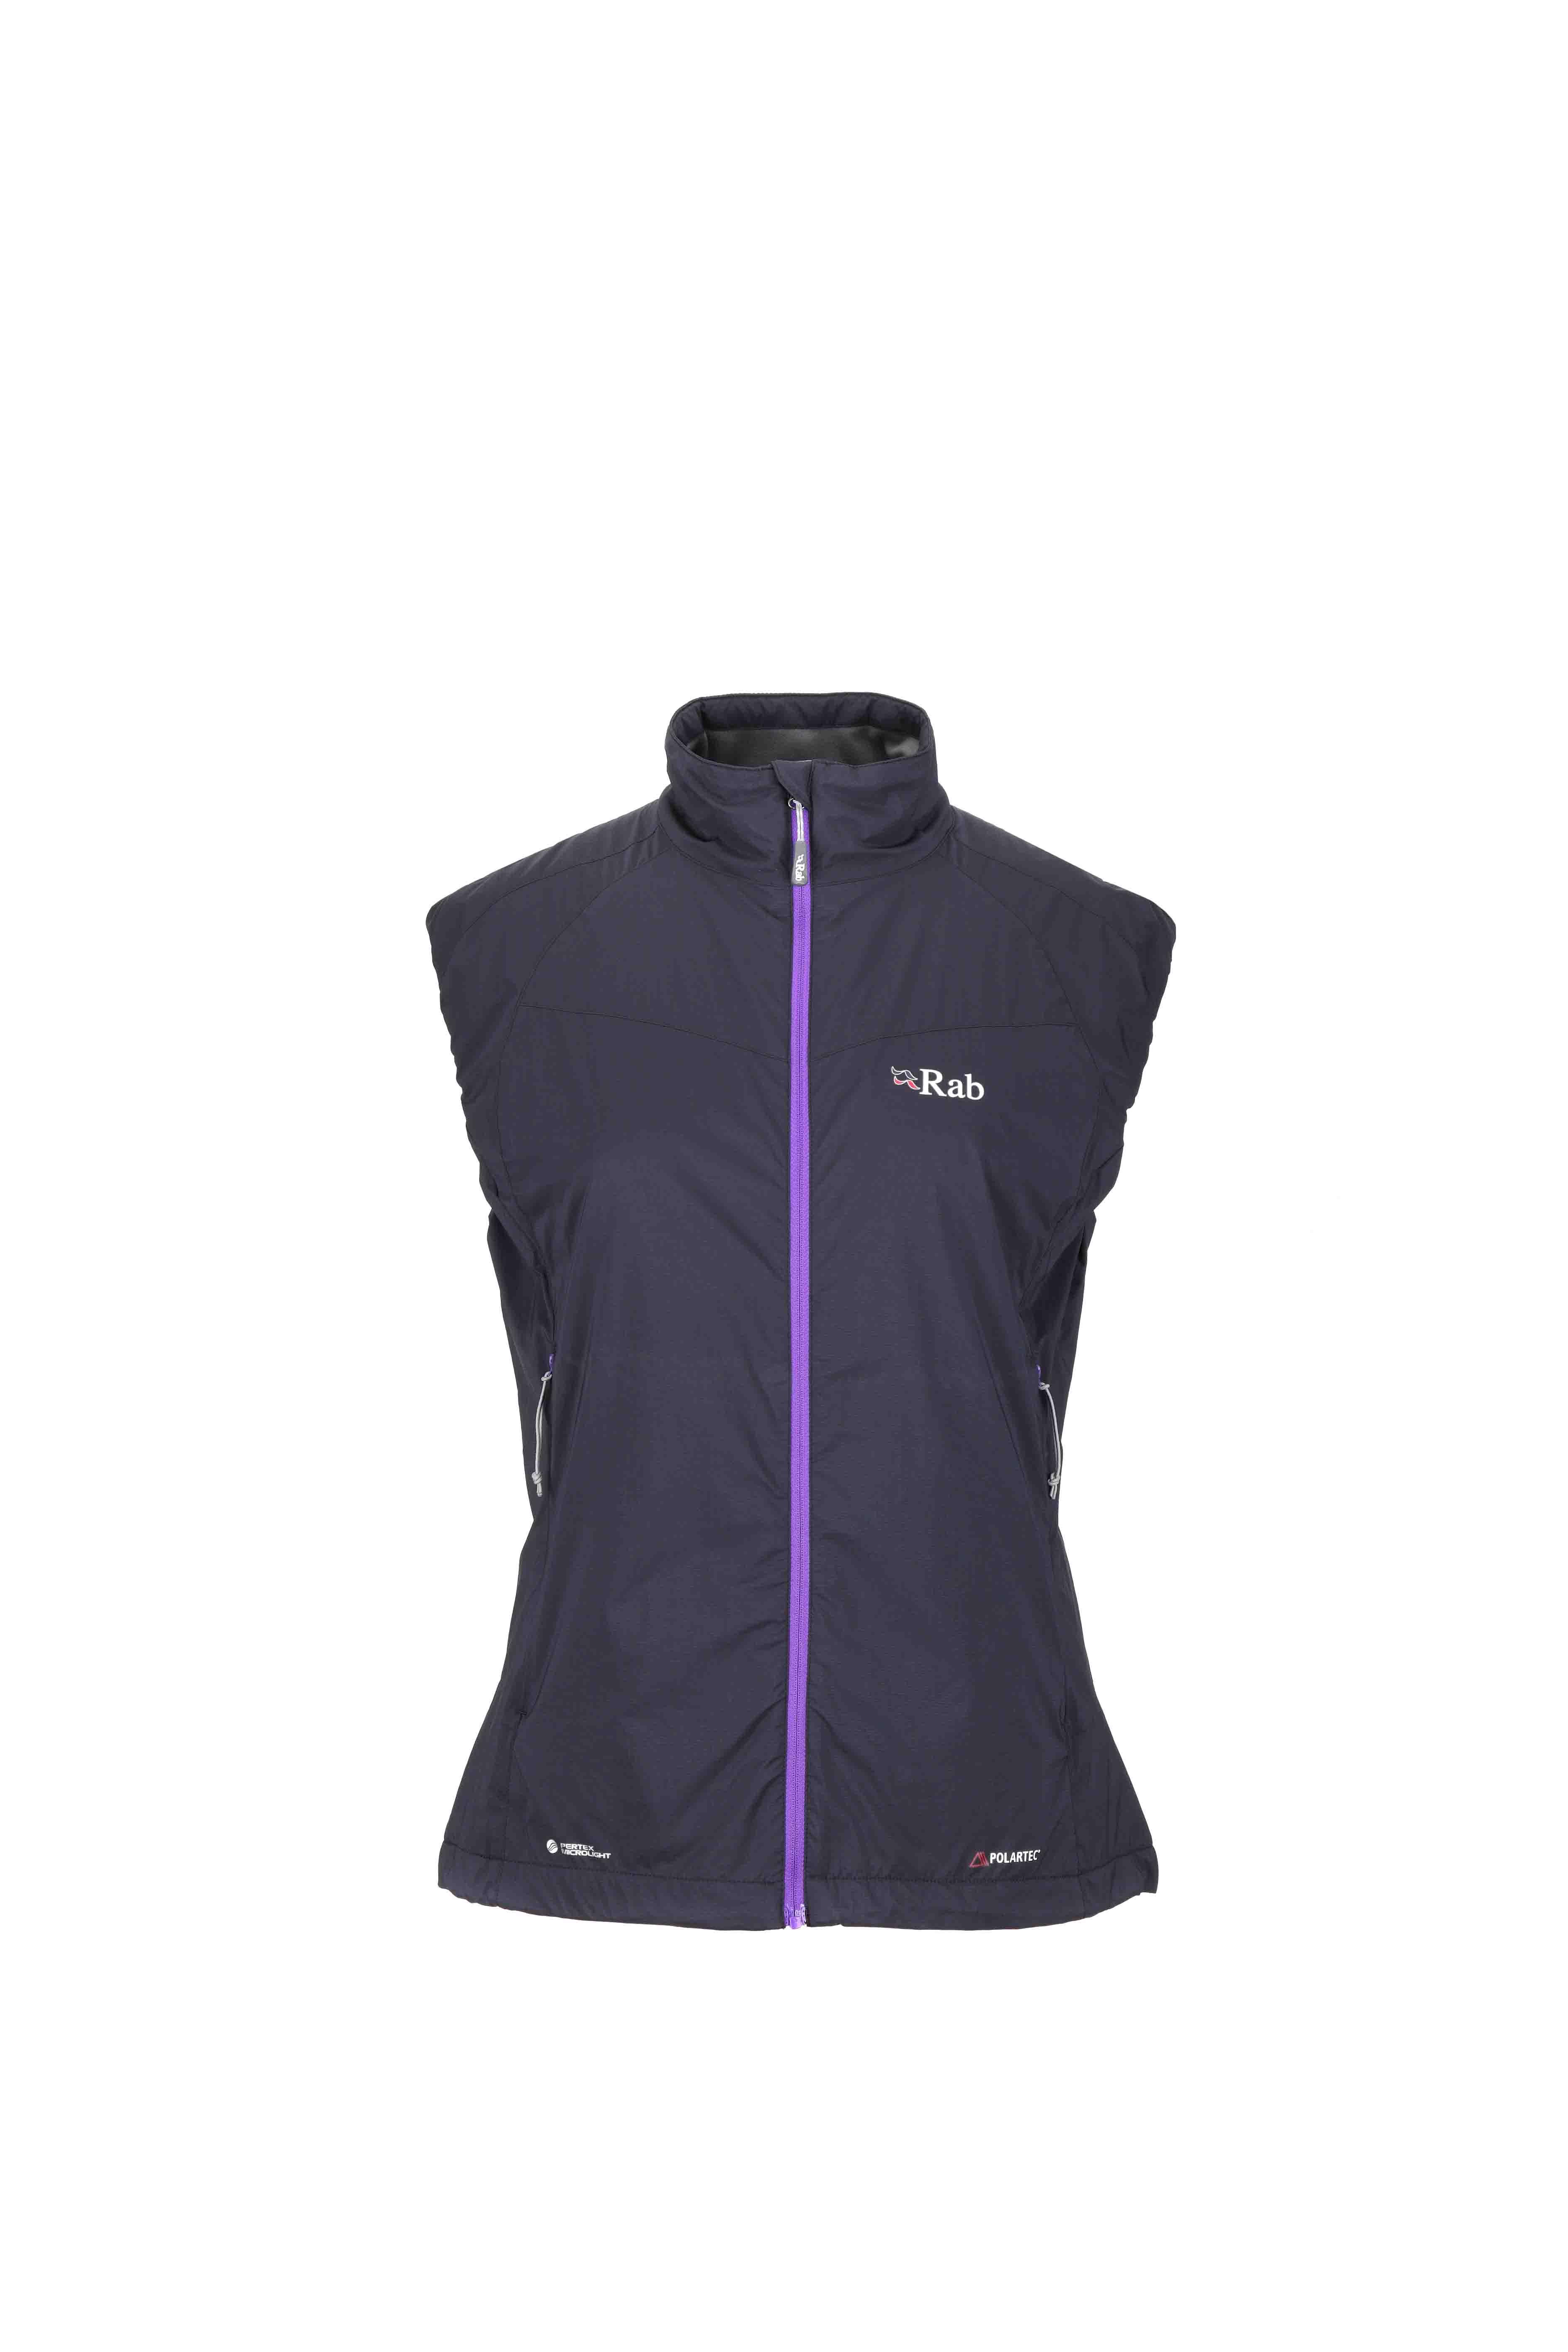 Rab women's Strata Vest with Polartecr Alphar